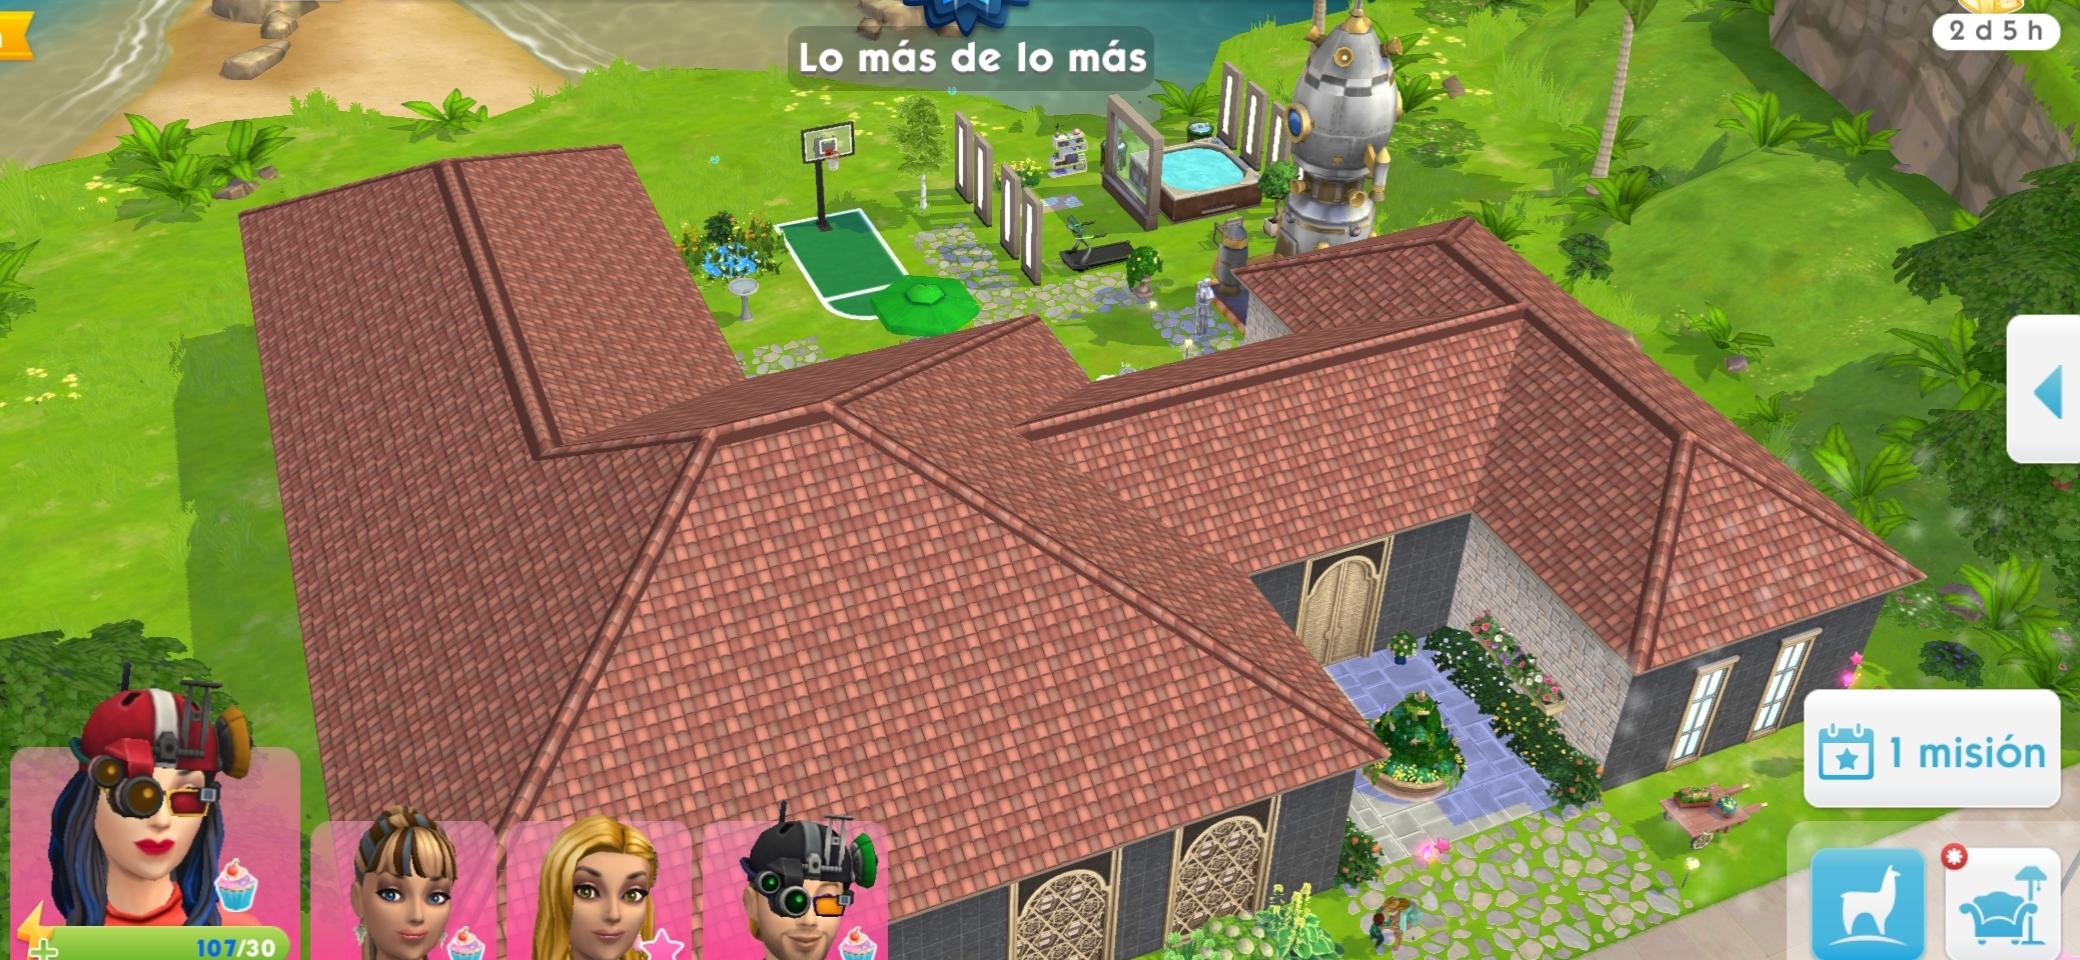 Screenshot_20190409-131449_The Sims.jpg